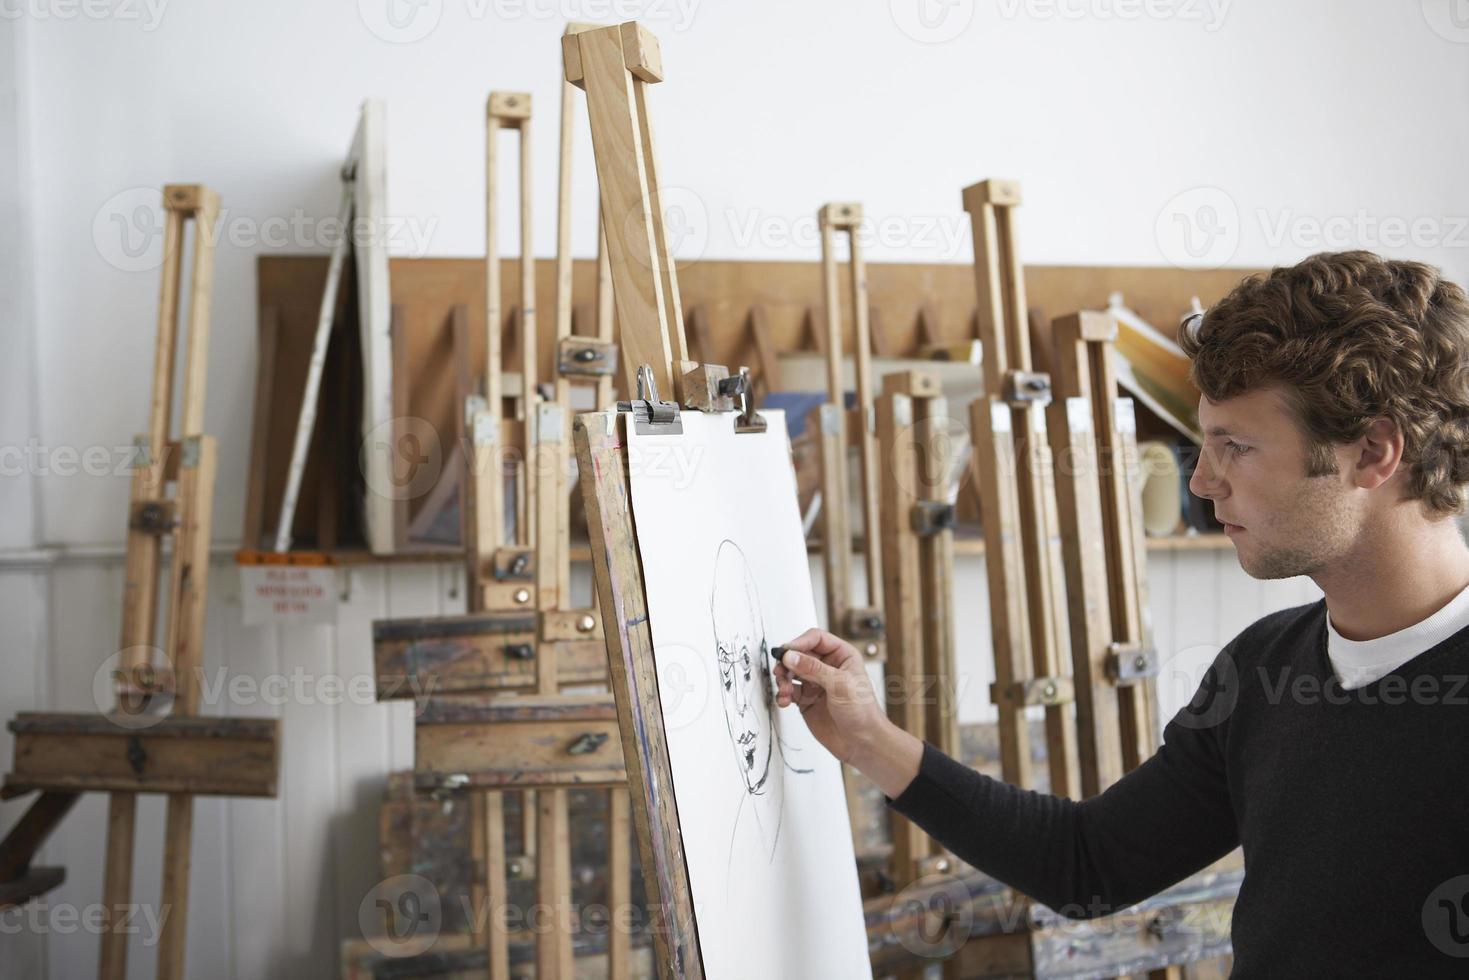 Artista dibujo retrato al carbón en studio foto